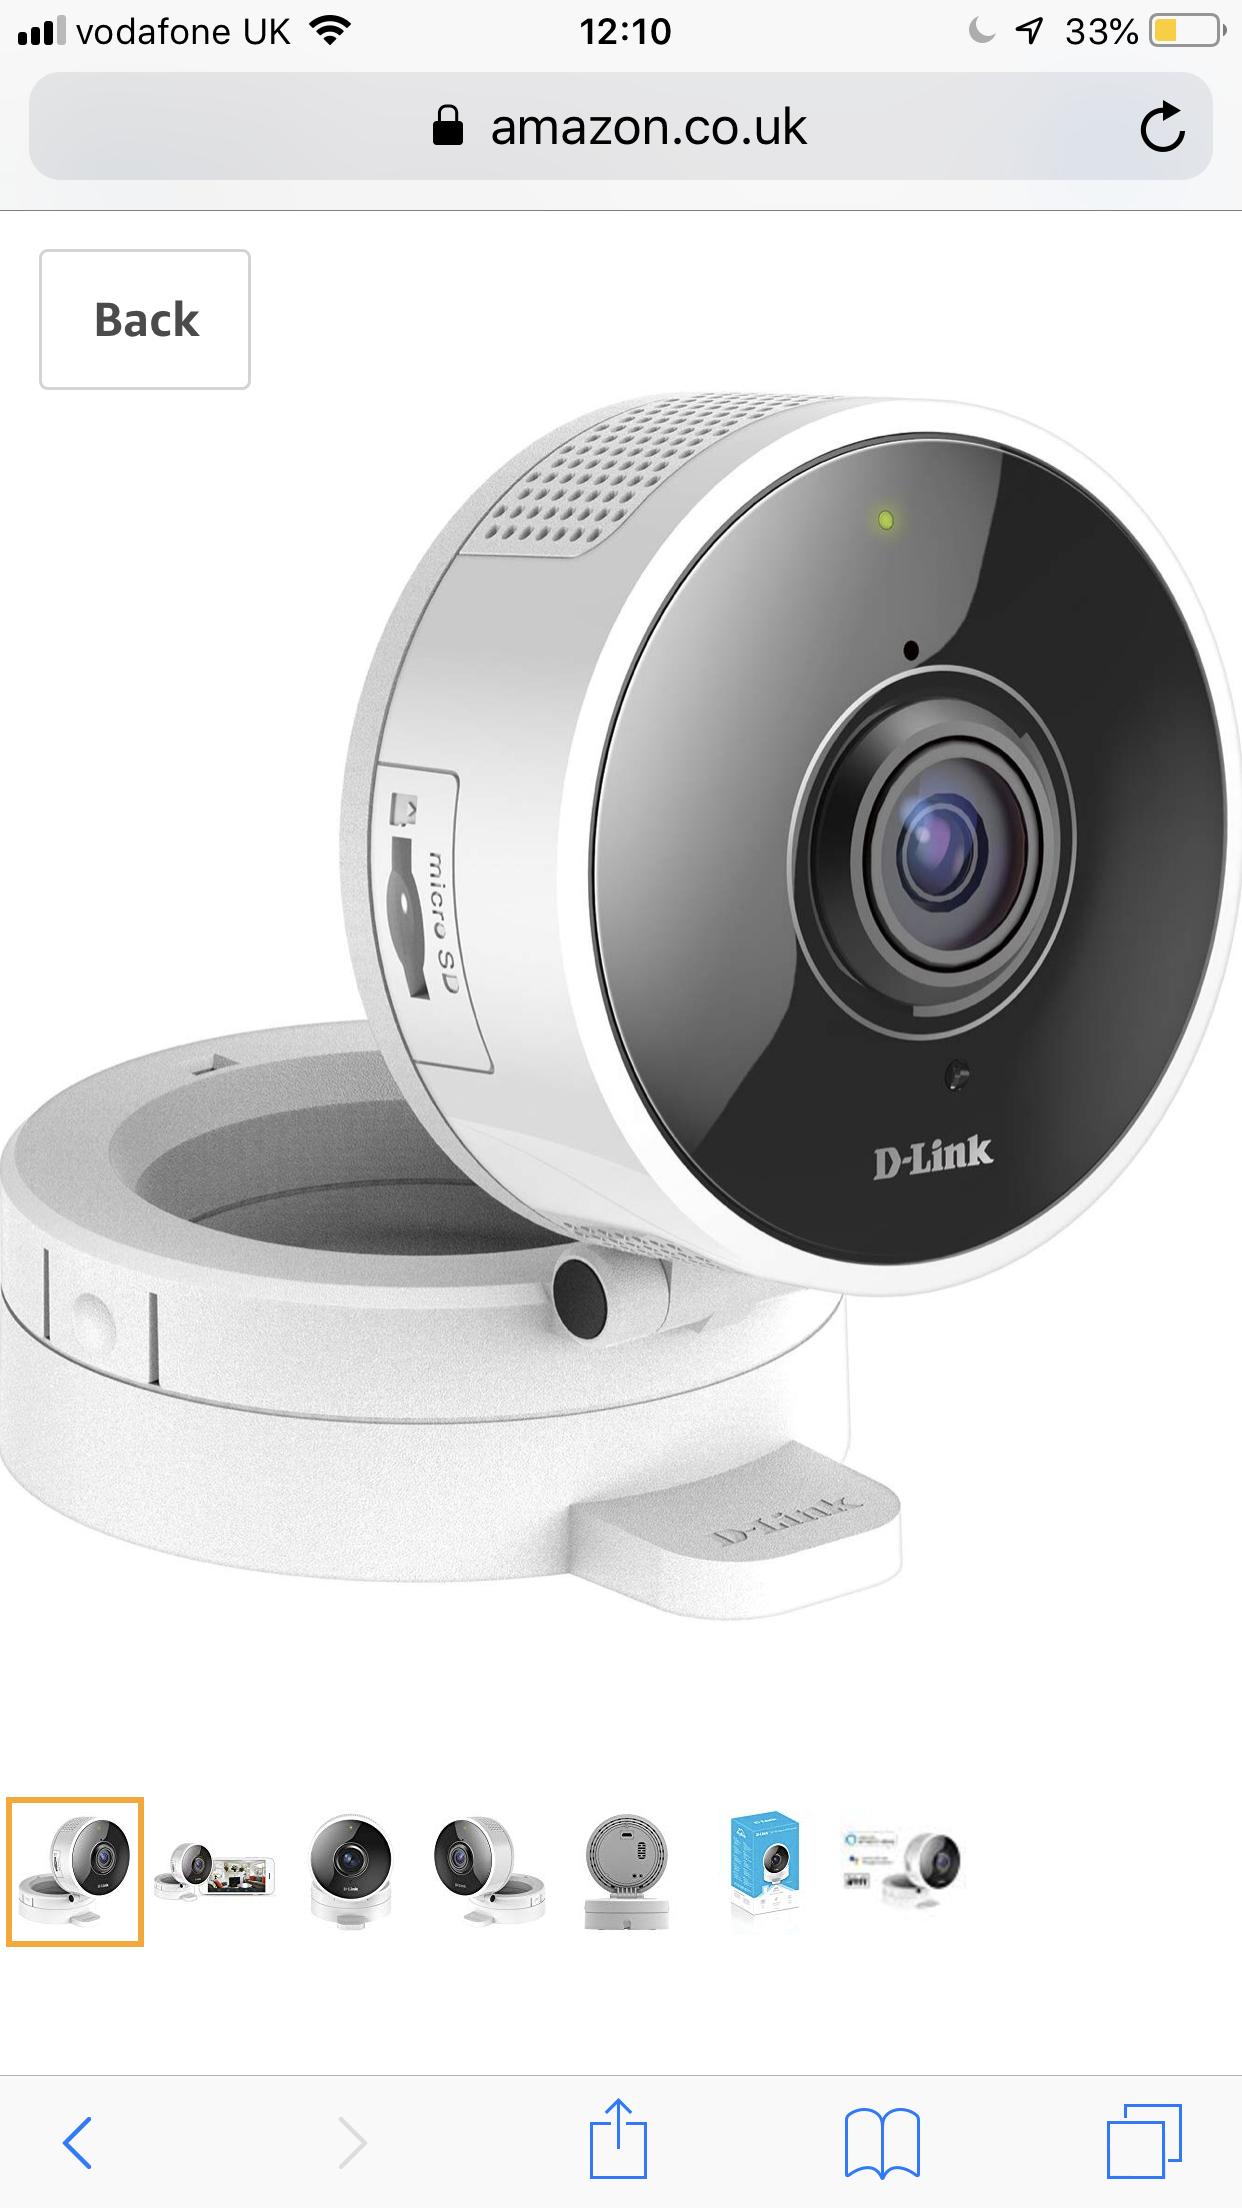 D-Link DCS-8100LH HD 180 Degree Wi-Fi Camera - @ Amazon £68.99